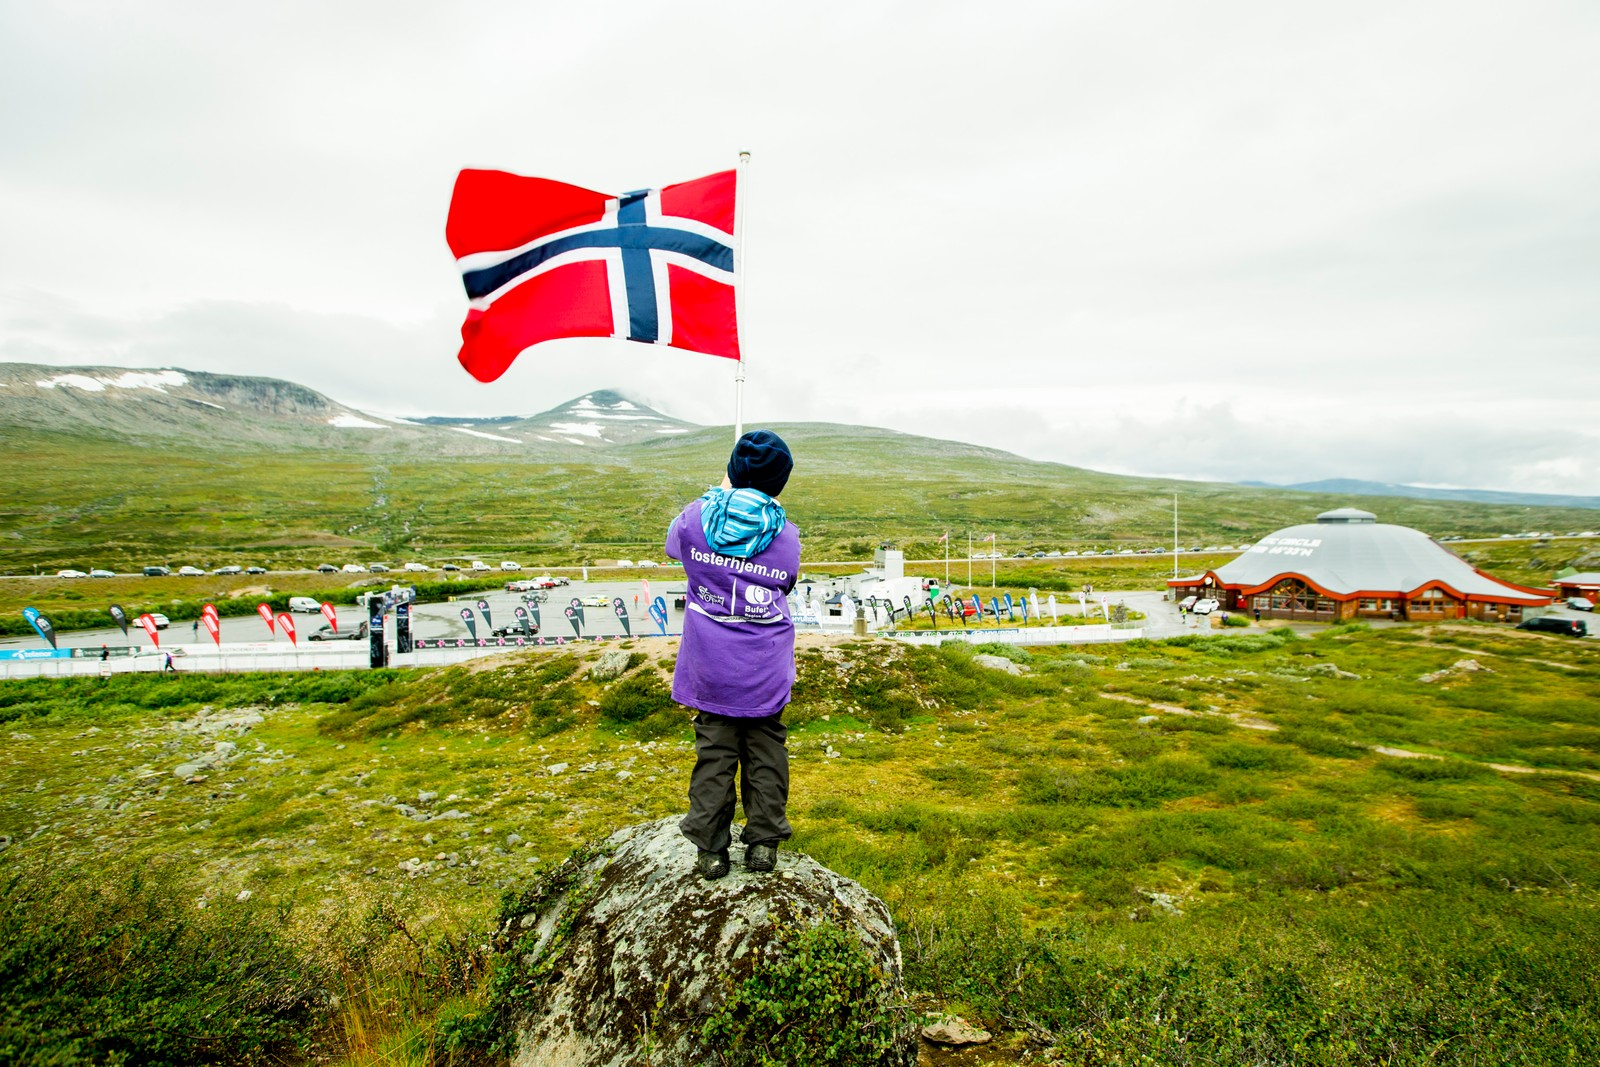 En gutt svaier med det norske flagget før fjerde og siste etappe i sykkelrittet Arctic Race of Norway søndag.